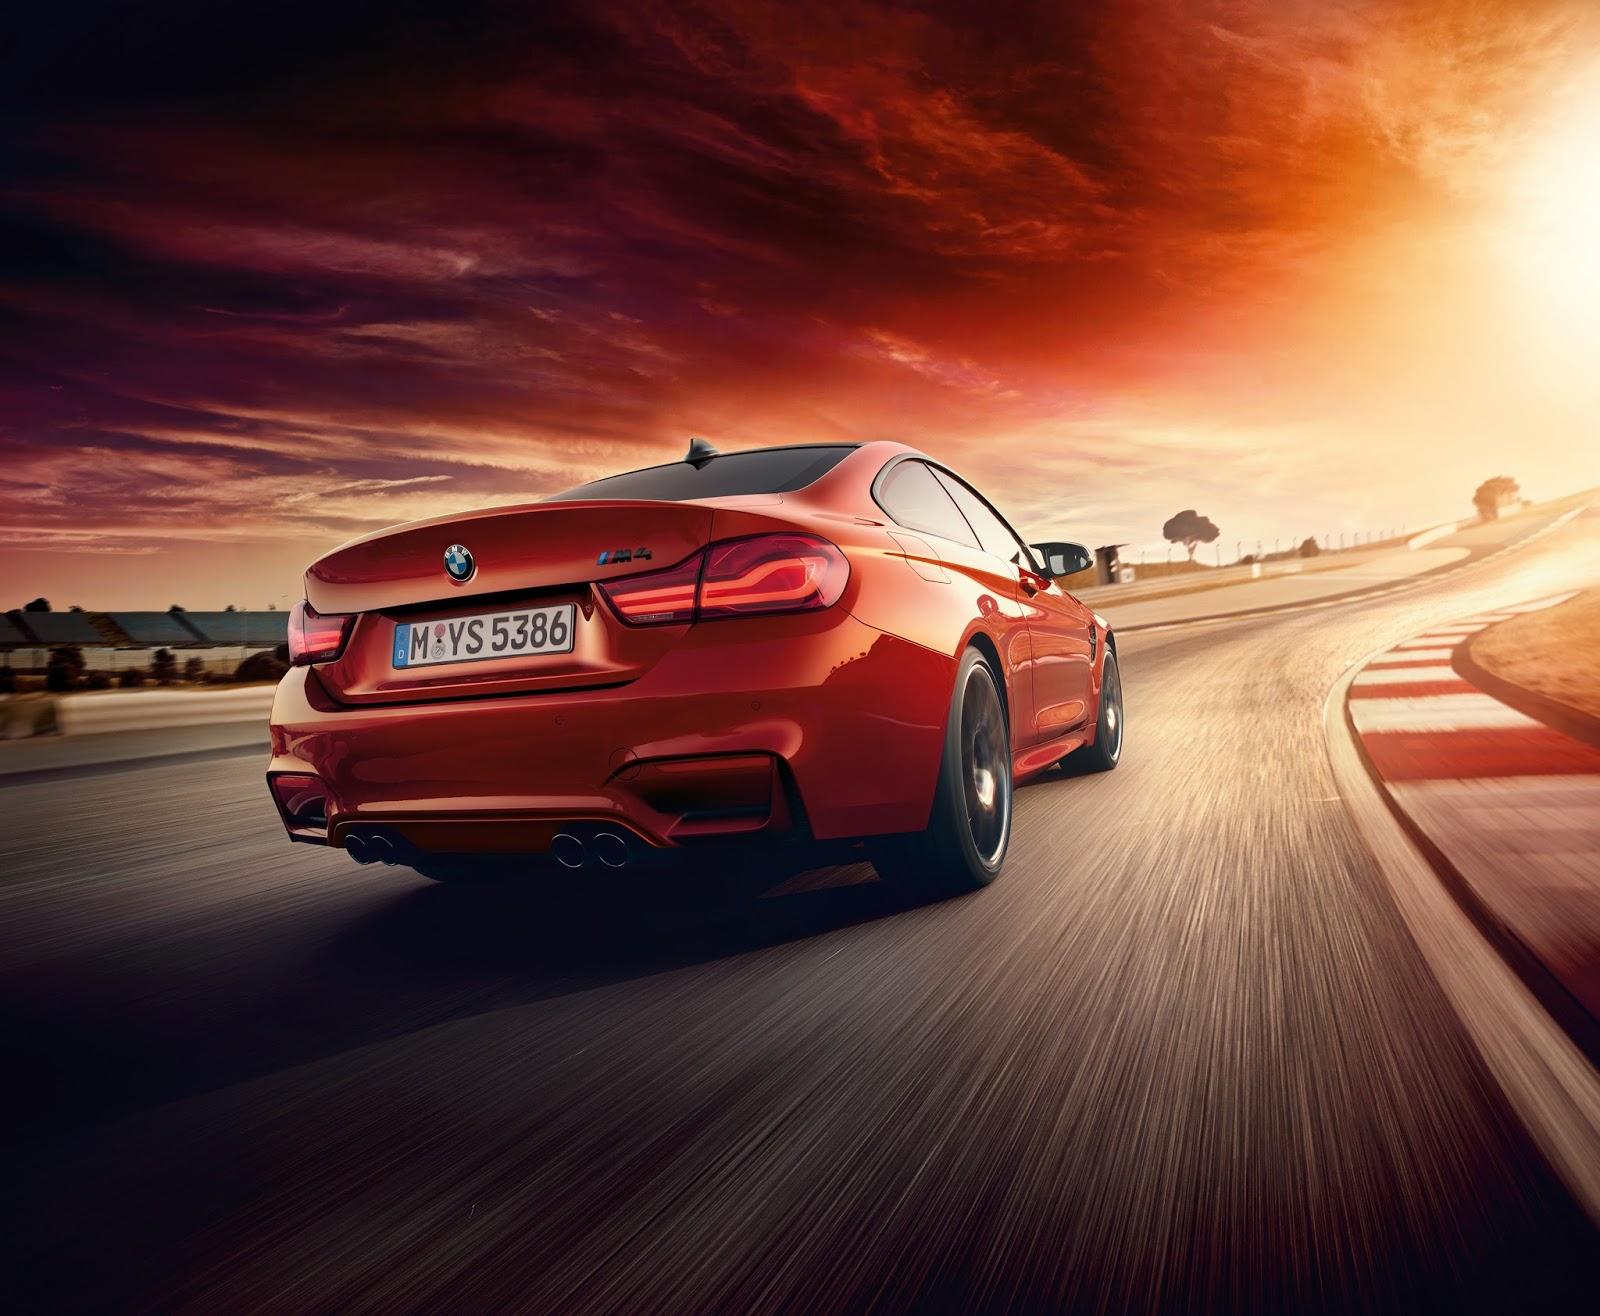 P90244965 highRes bmw m4 coup 01 2017 Η νέα BMW Σειρά 4, με πιο σφιχτή ρύθμιση ανάρτησης BMW, Bmw 4, BMW 4 Cabrio, BMW 4 Coupe, BMW 4 Gran Coupé, Facelift